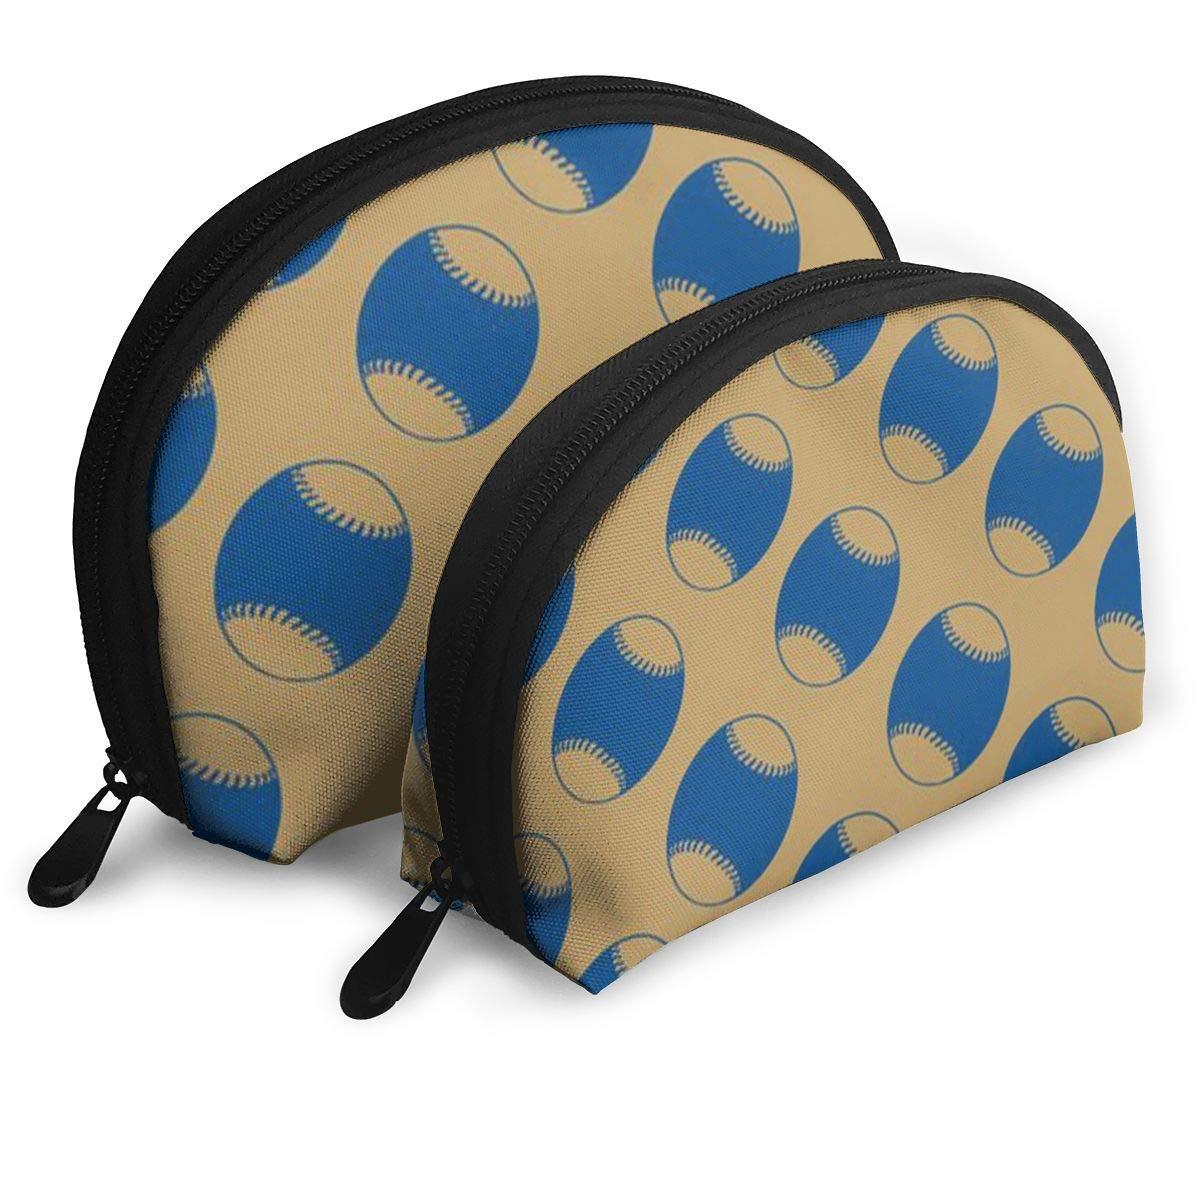 Half Moon Cosmetic Beauty Bag,Baseball Handy Cosmetic Pouch Clutch Makeup Bag For Women Girls